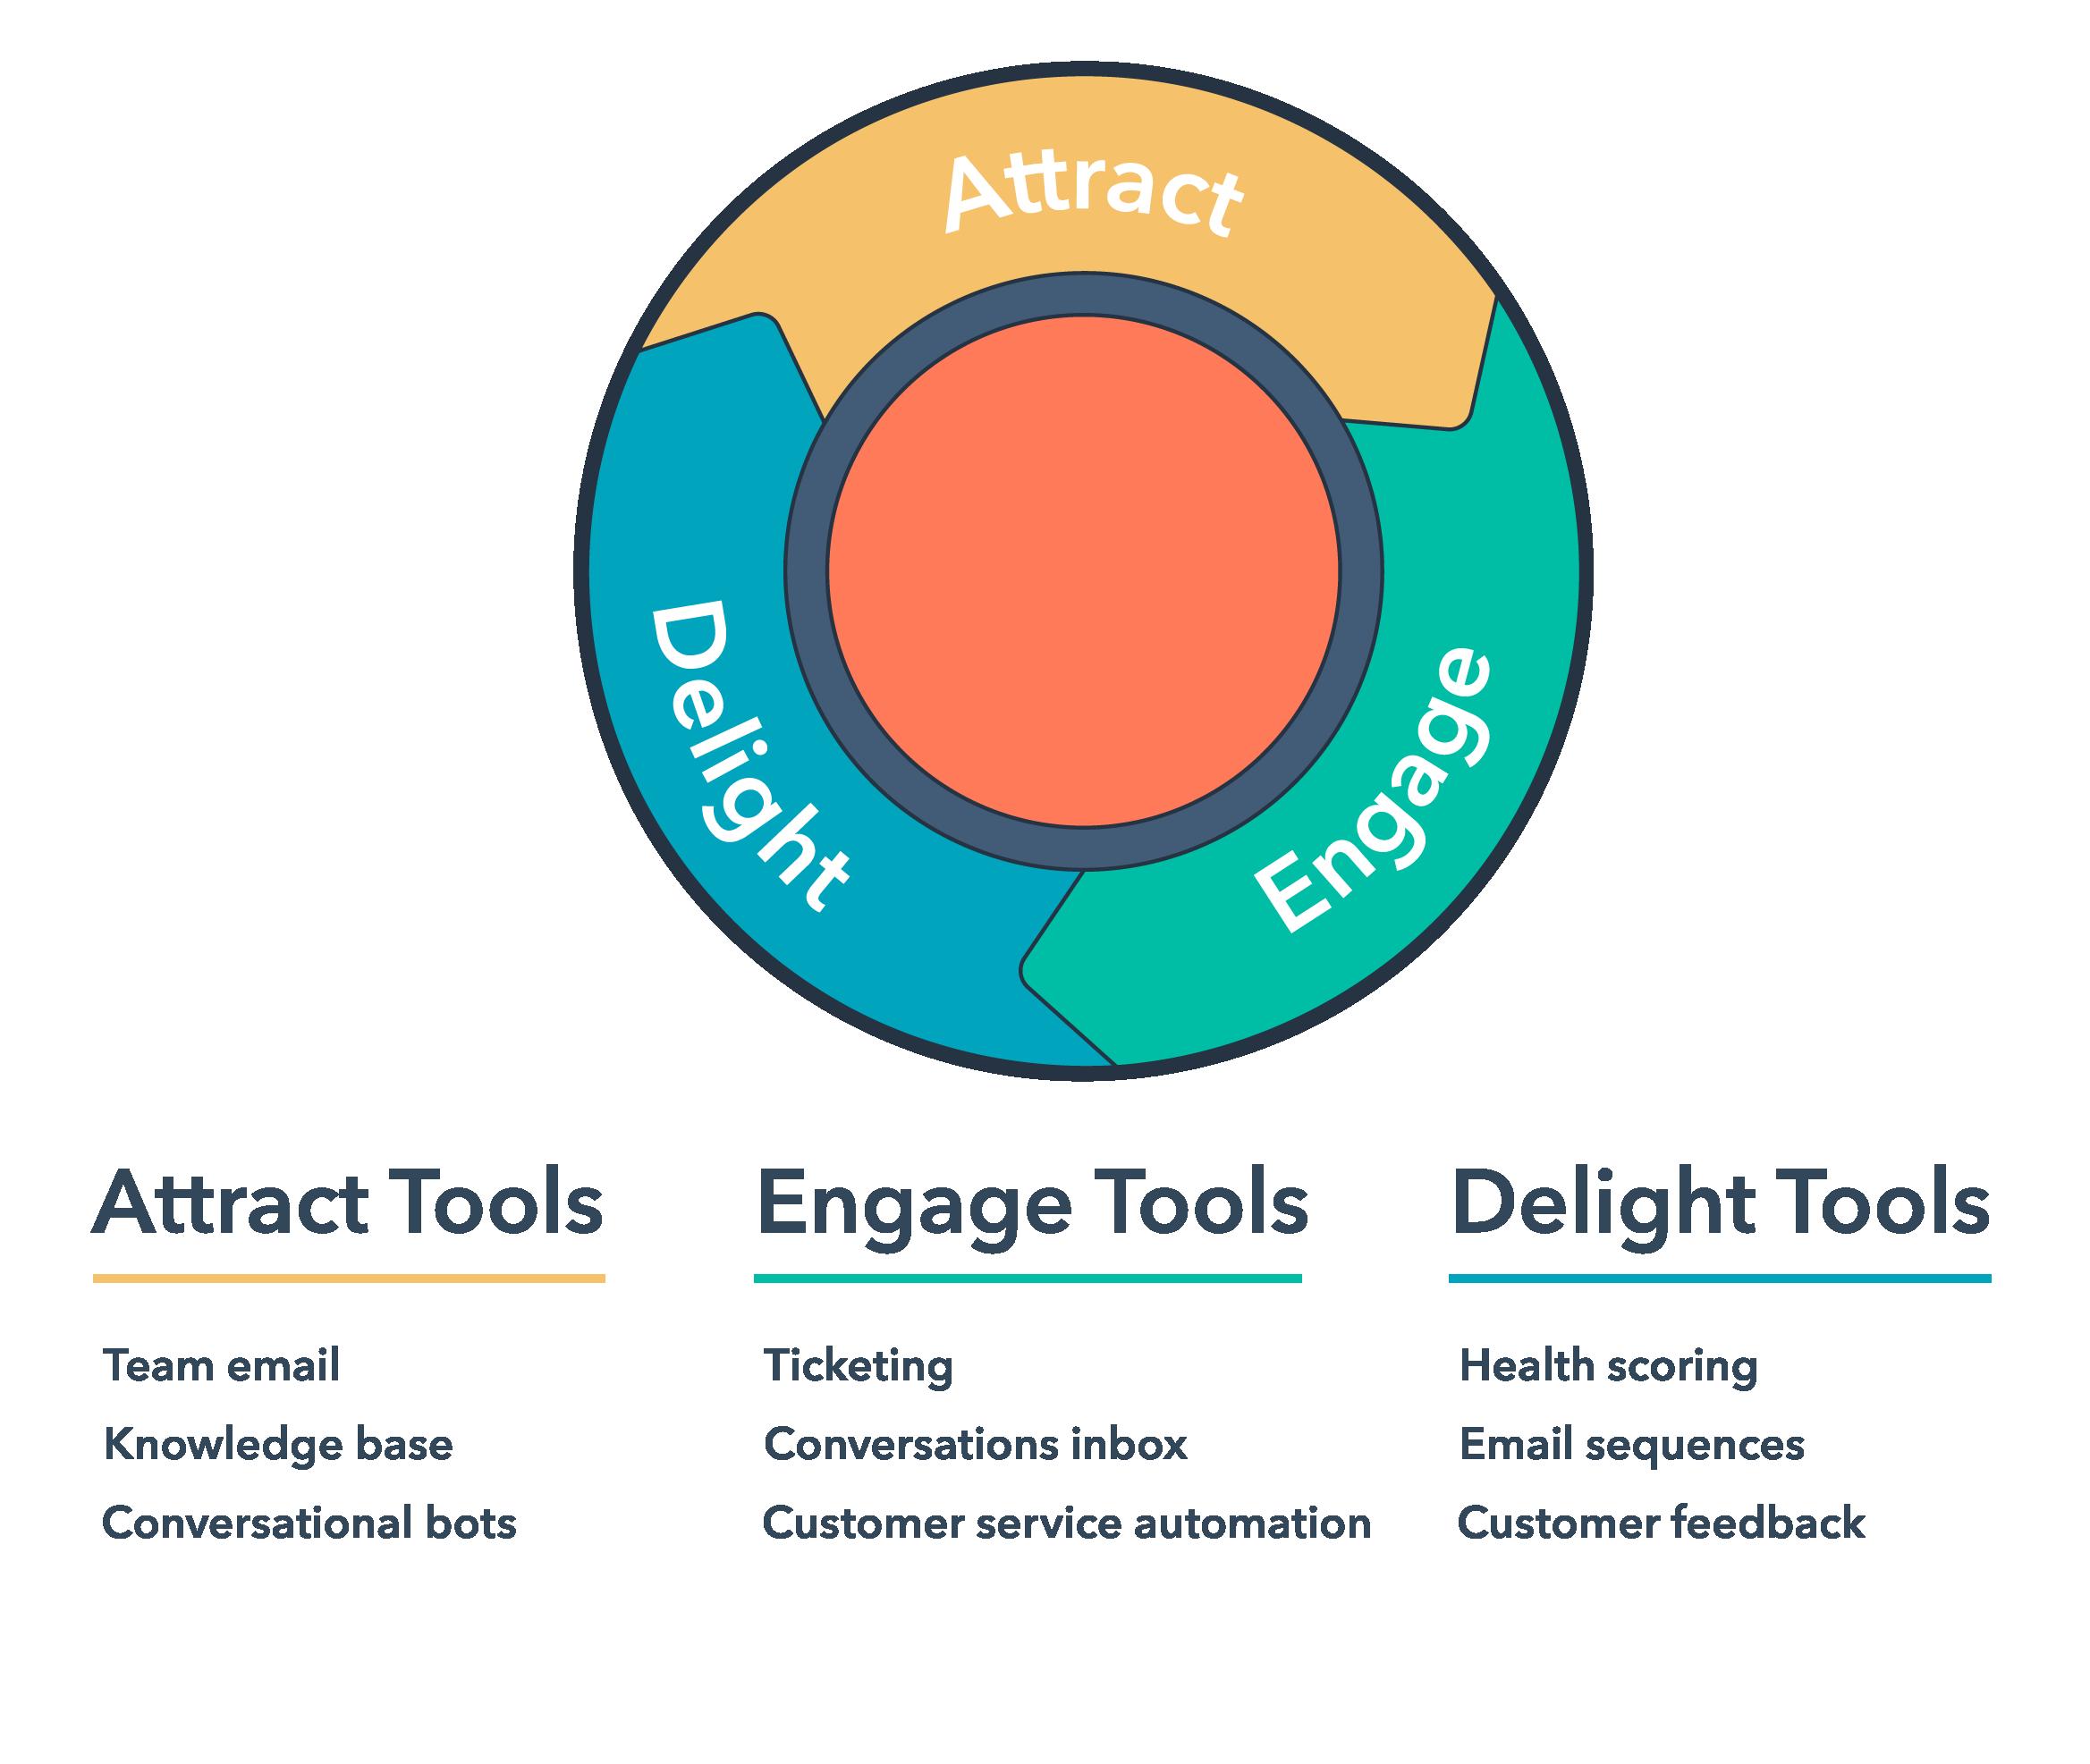 IM-service-hub-tools